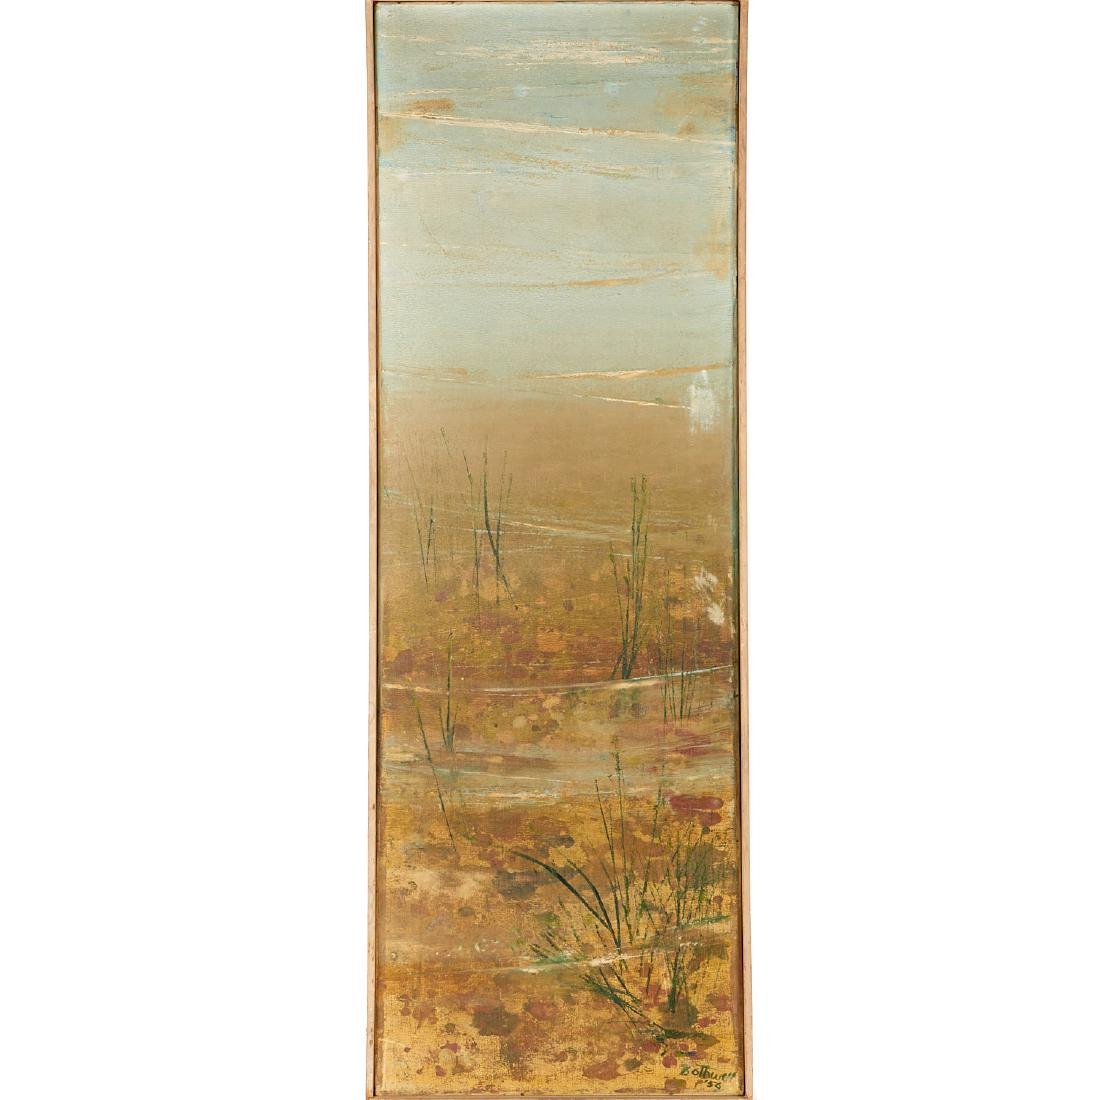 Dorr Bothwell, California painting